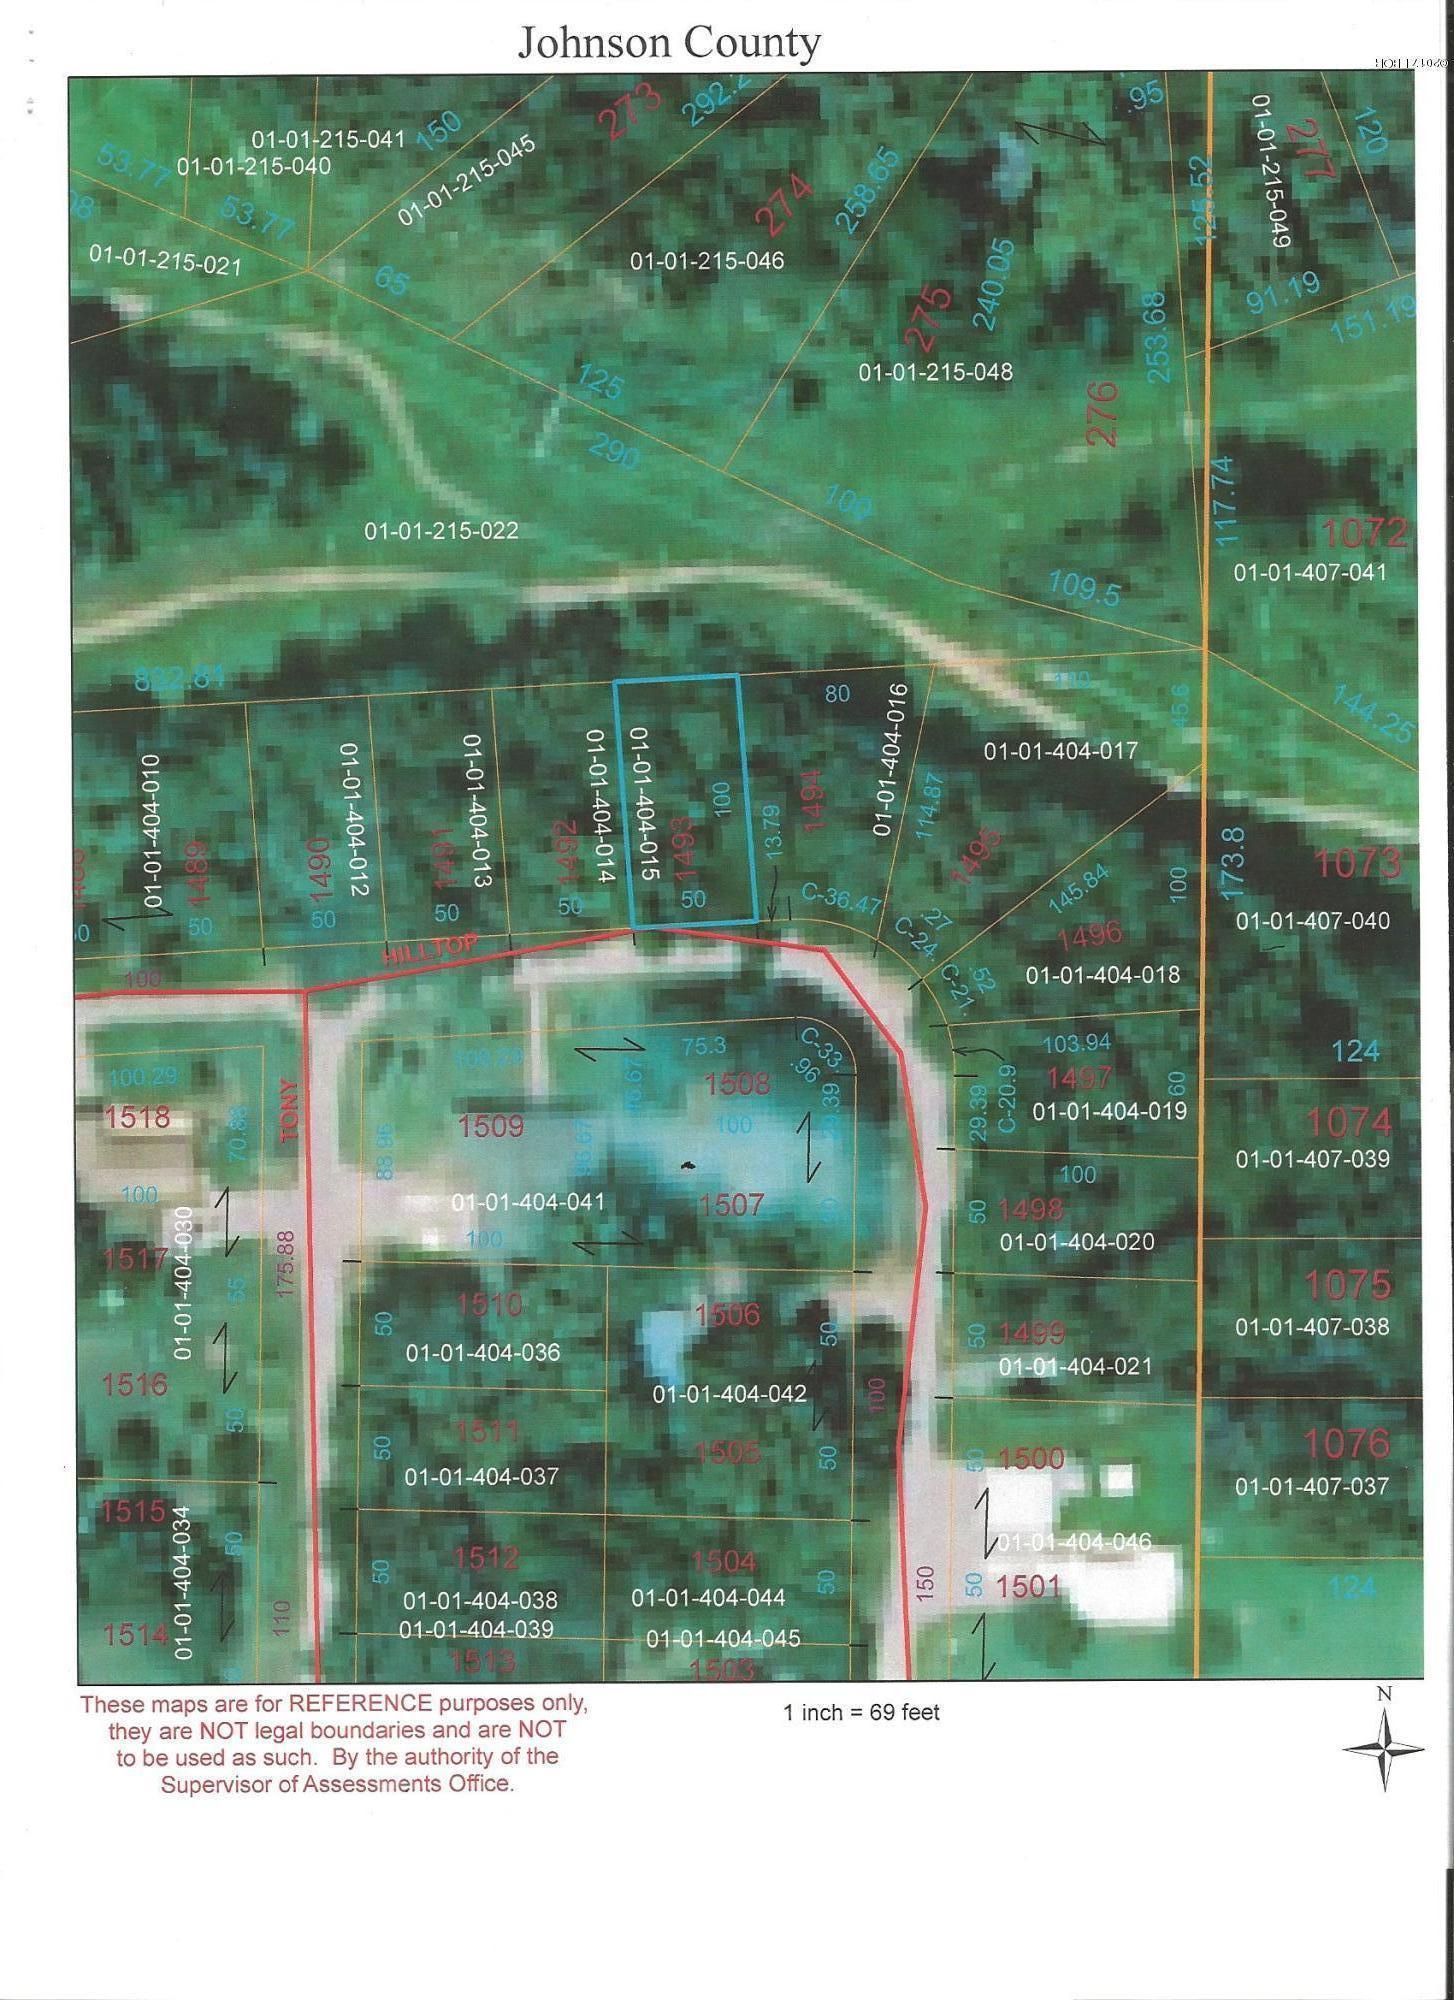 MLS: 423788: 1493 Hilltop Circle Goreville